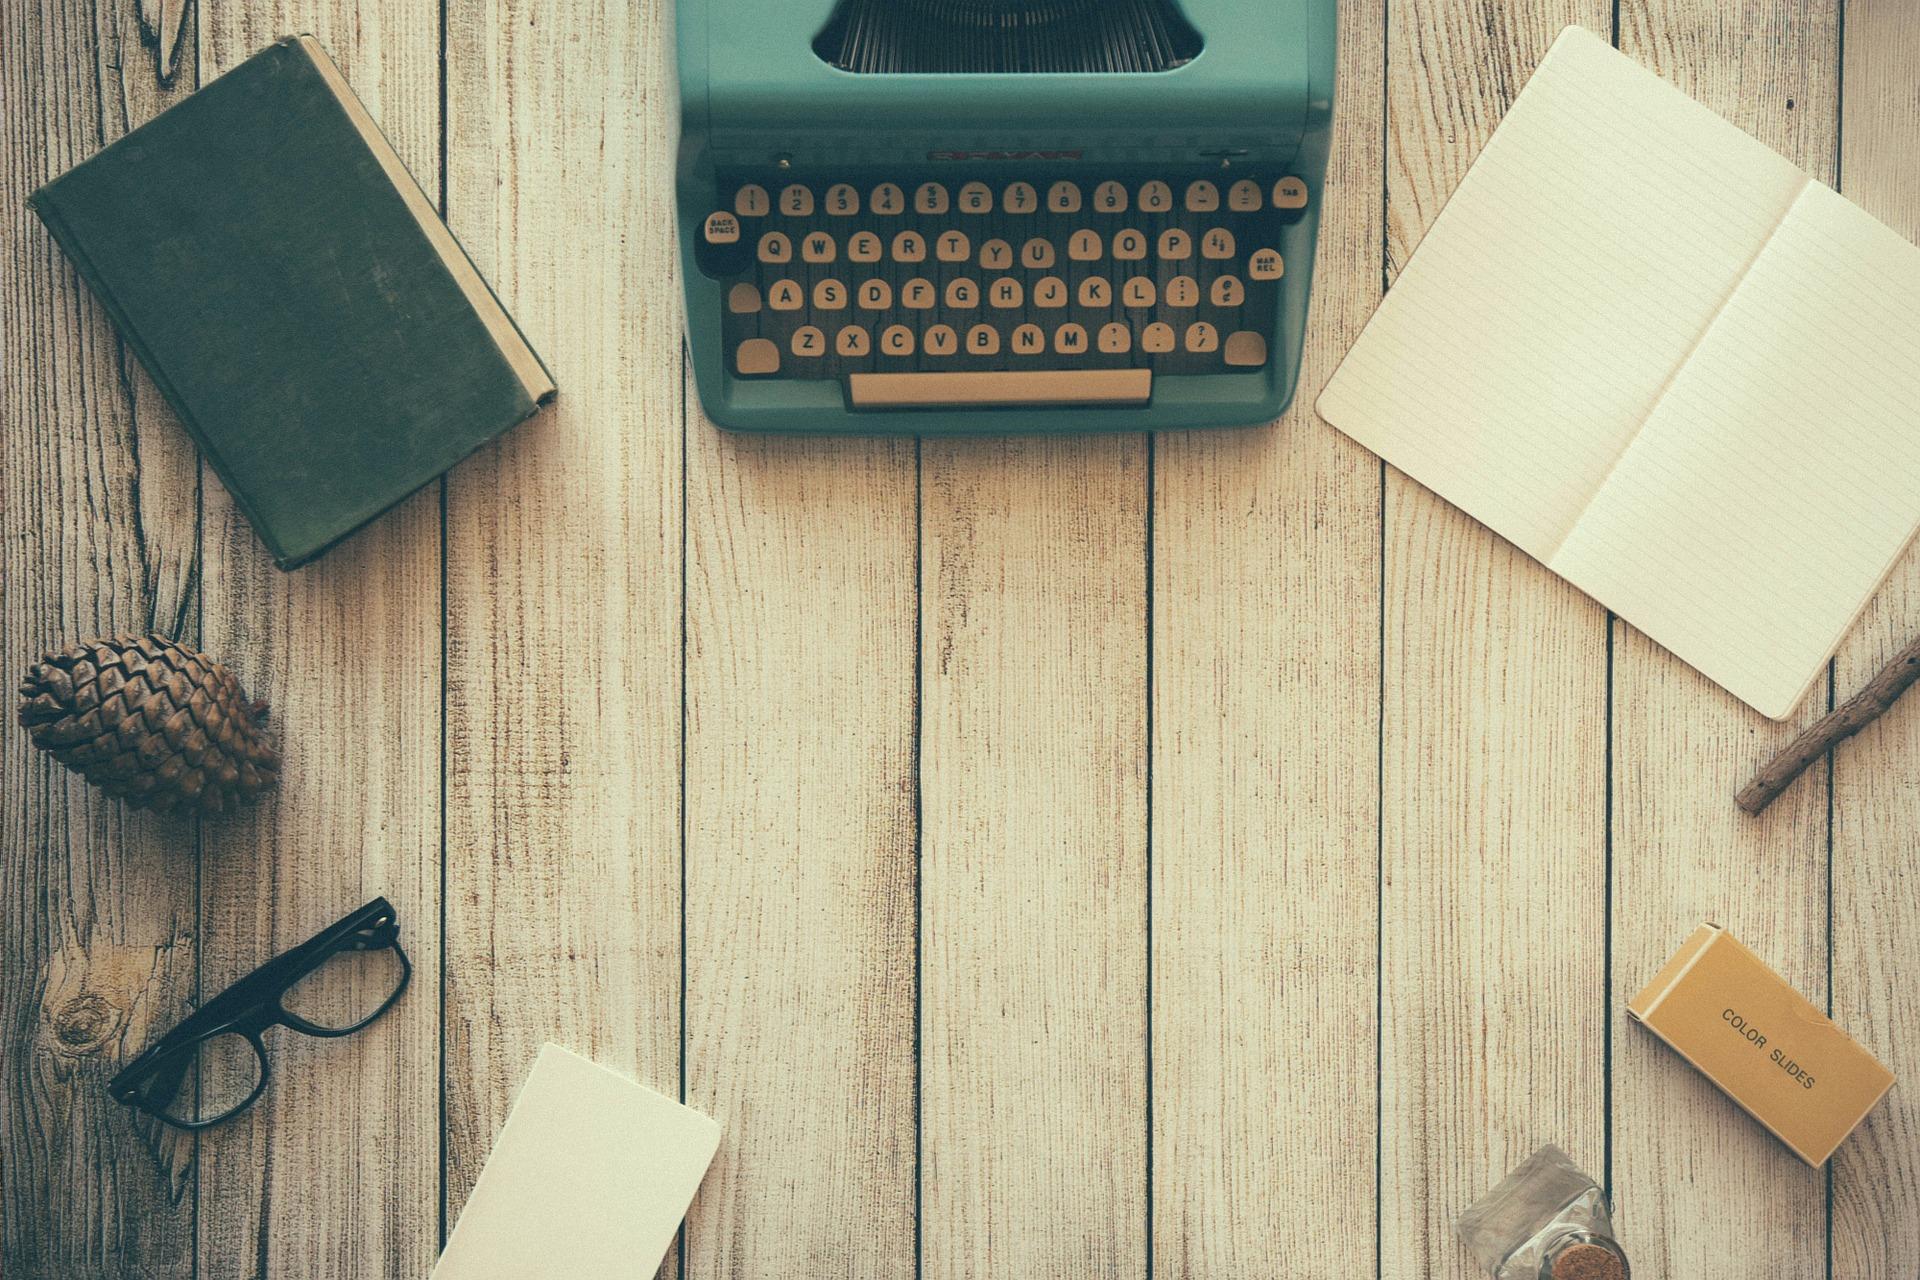 freelance writer, editor, proofreader, author, blogging